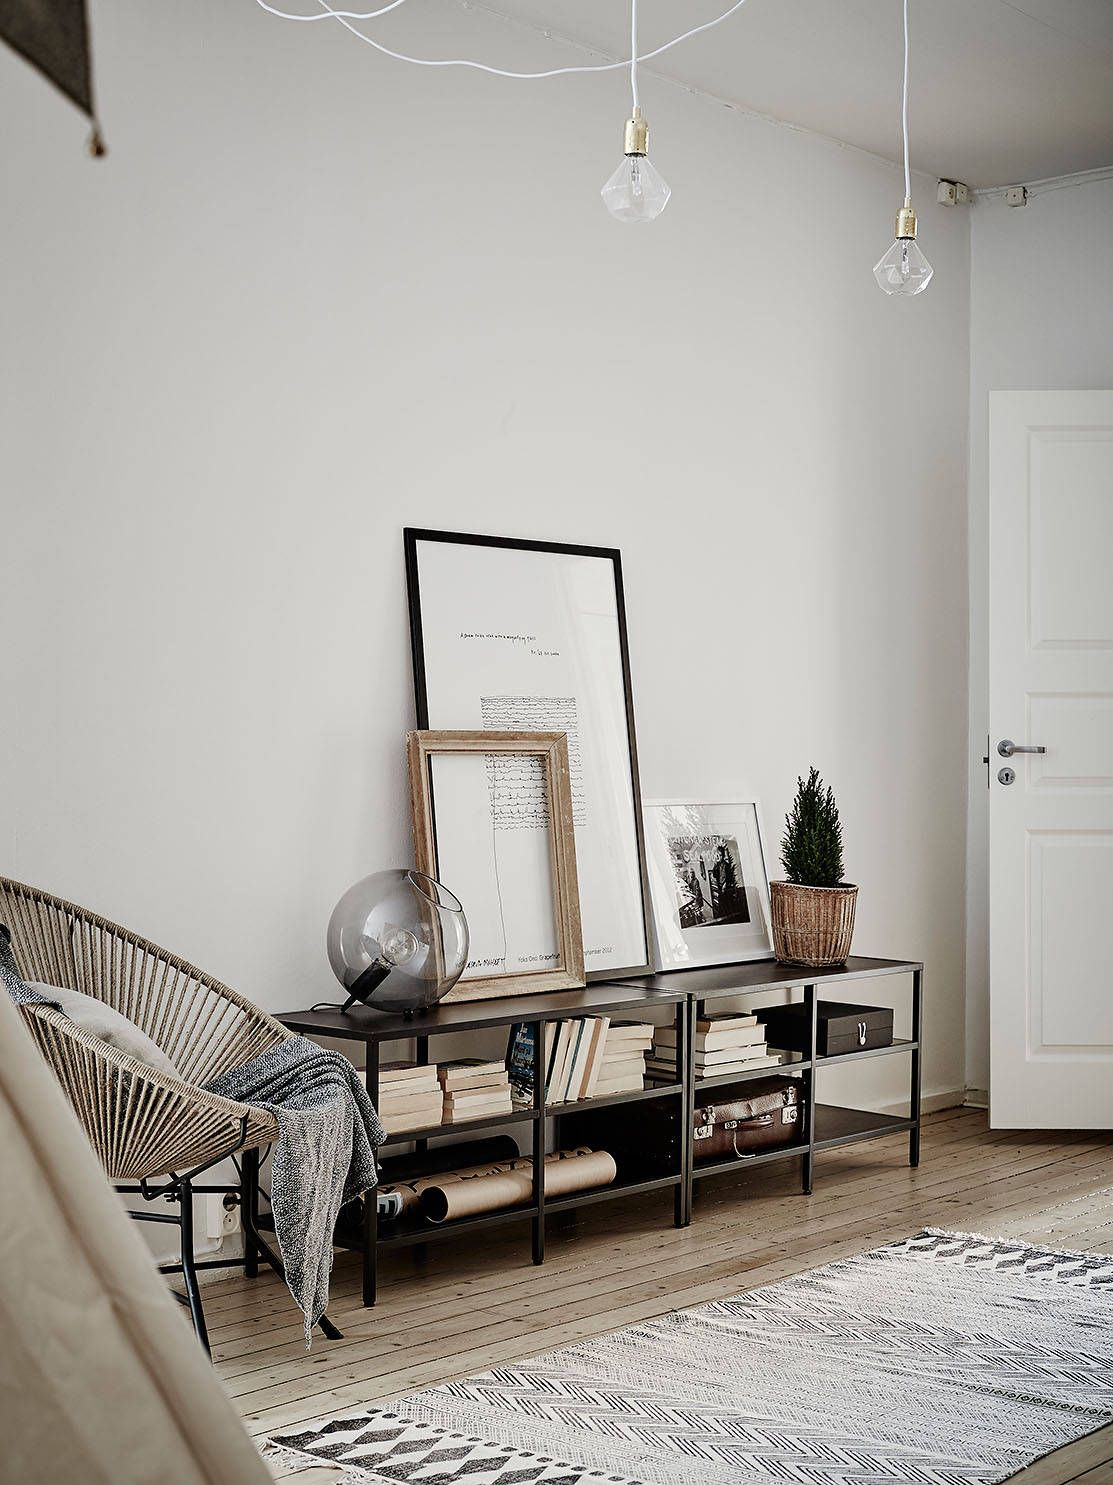 Home hall design-ideen nordhemsgatan  a  stadshem  living room  pinterest  characters